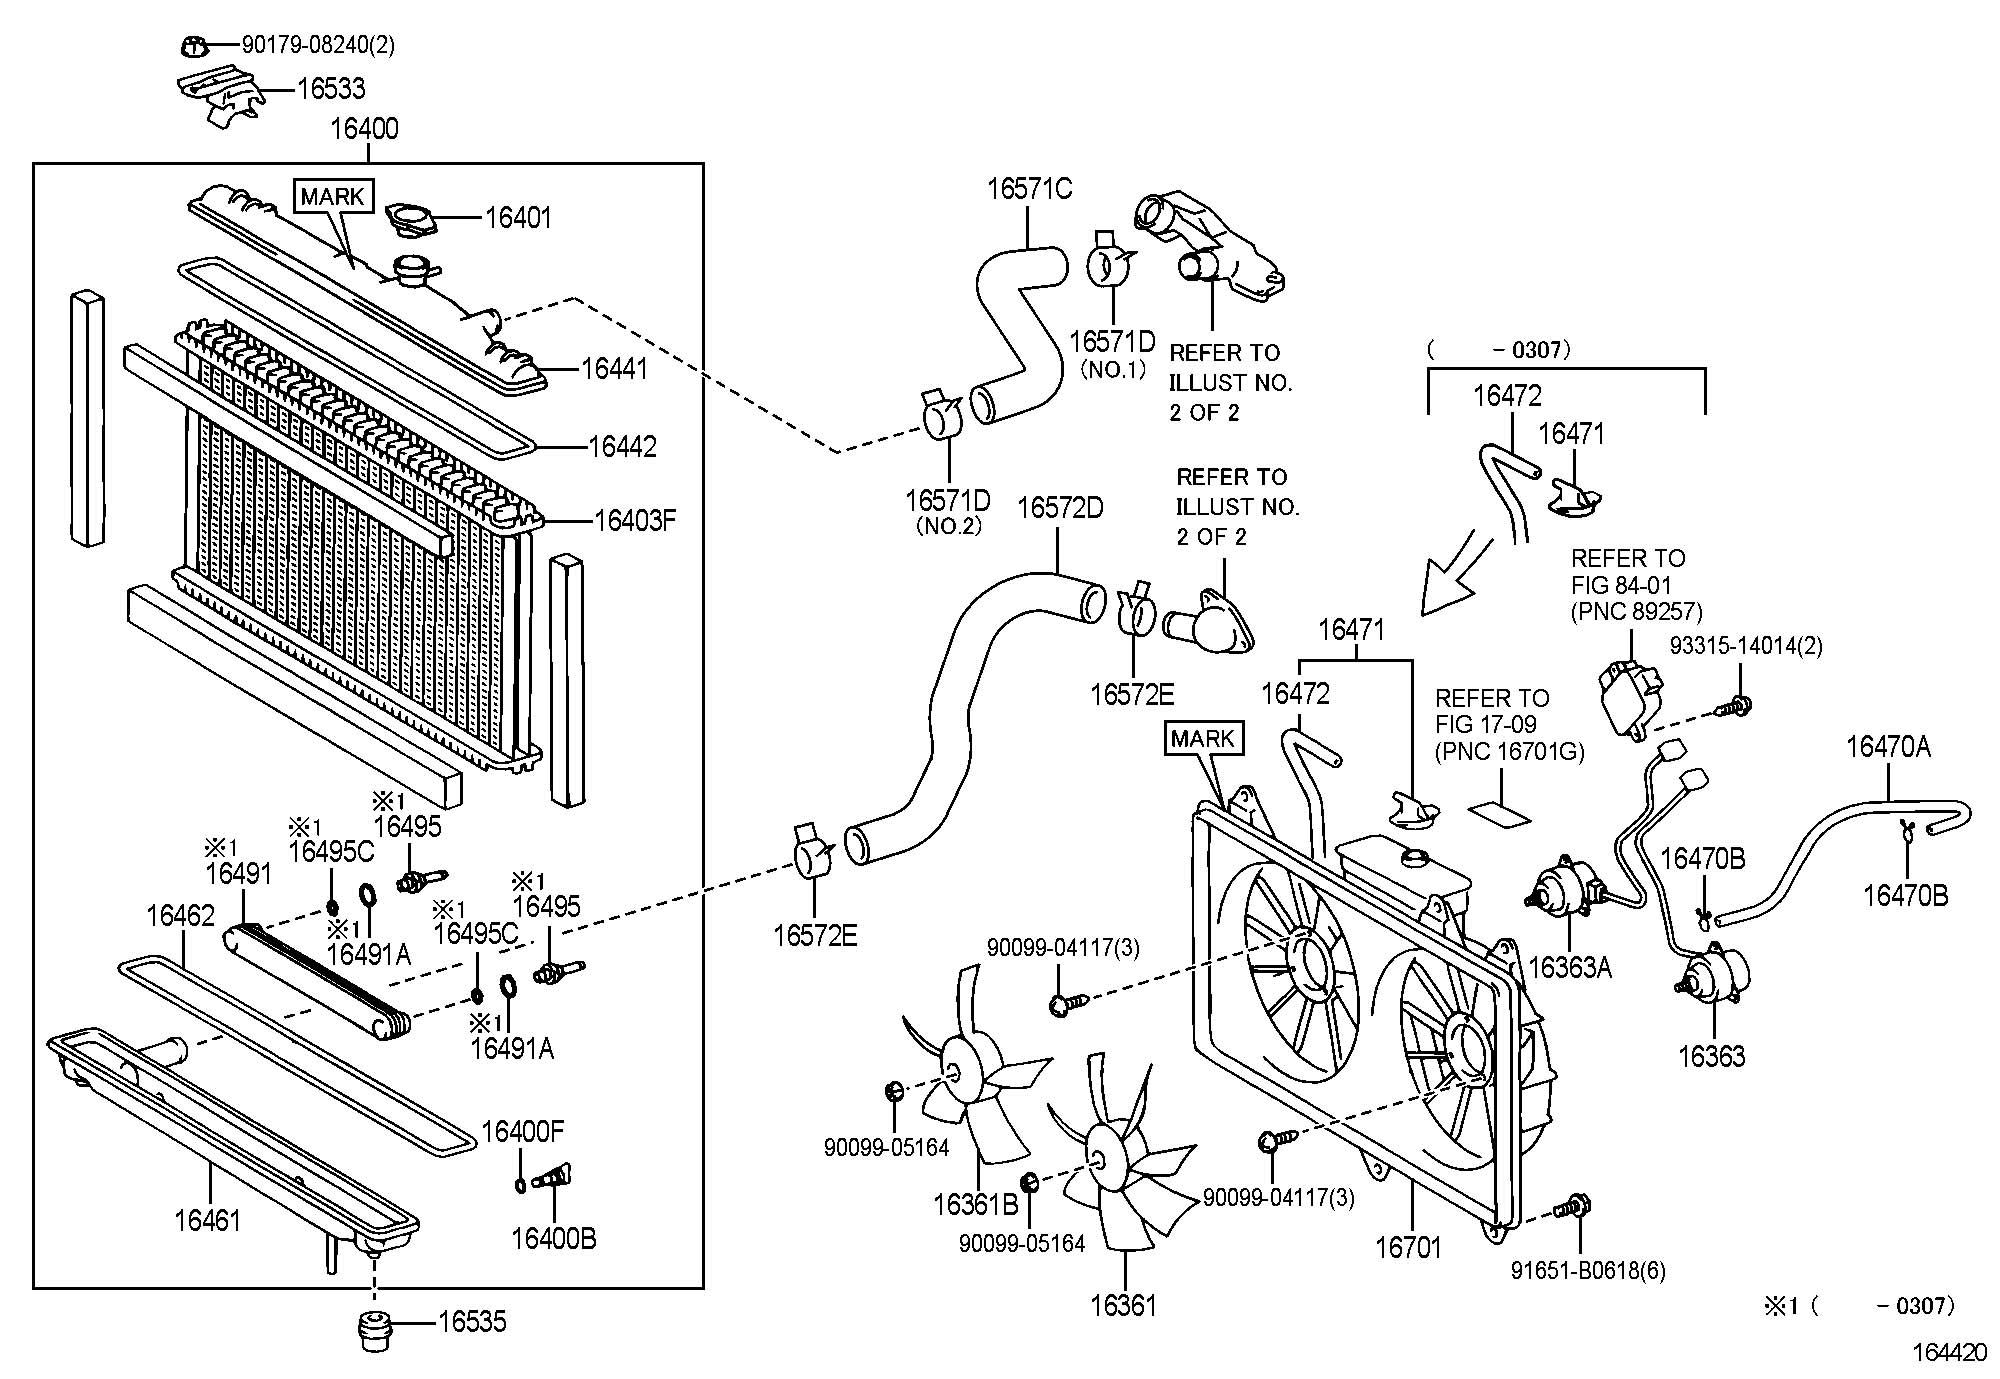 2003 lexus ls 430 engine diagram ls430 gearbox/transmission design question - ls 400 ... 2003 lexus es 300 wiring diagram